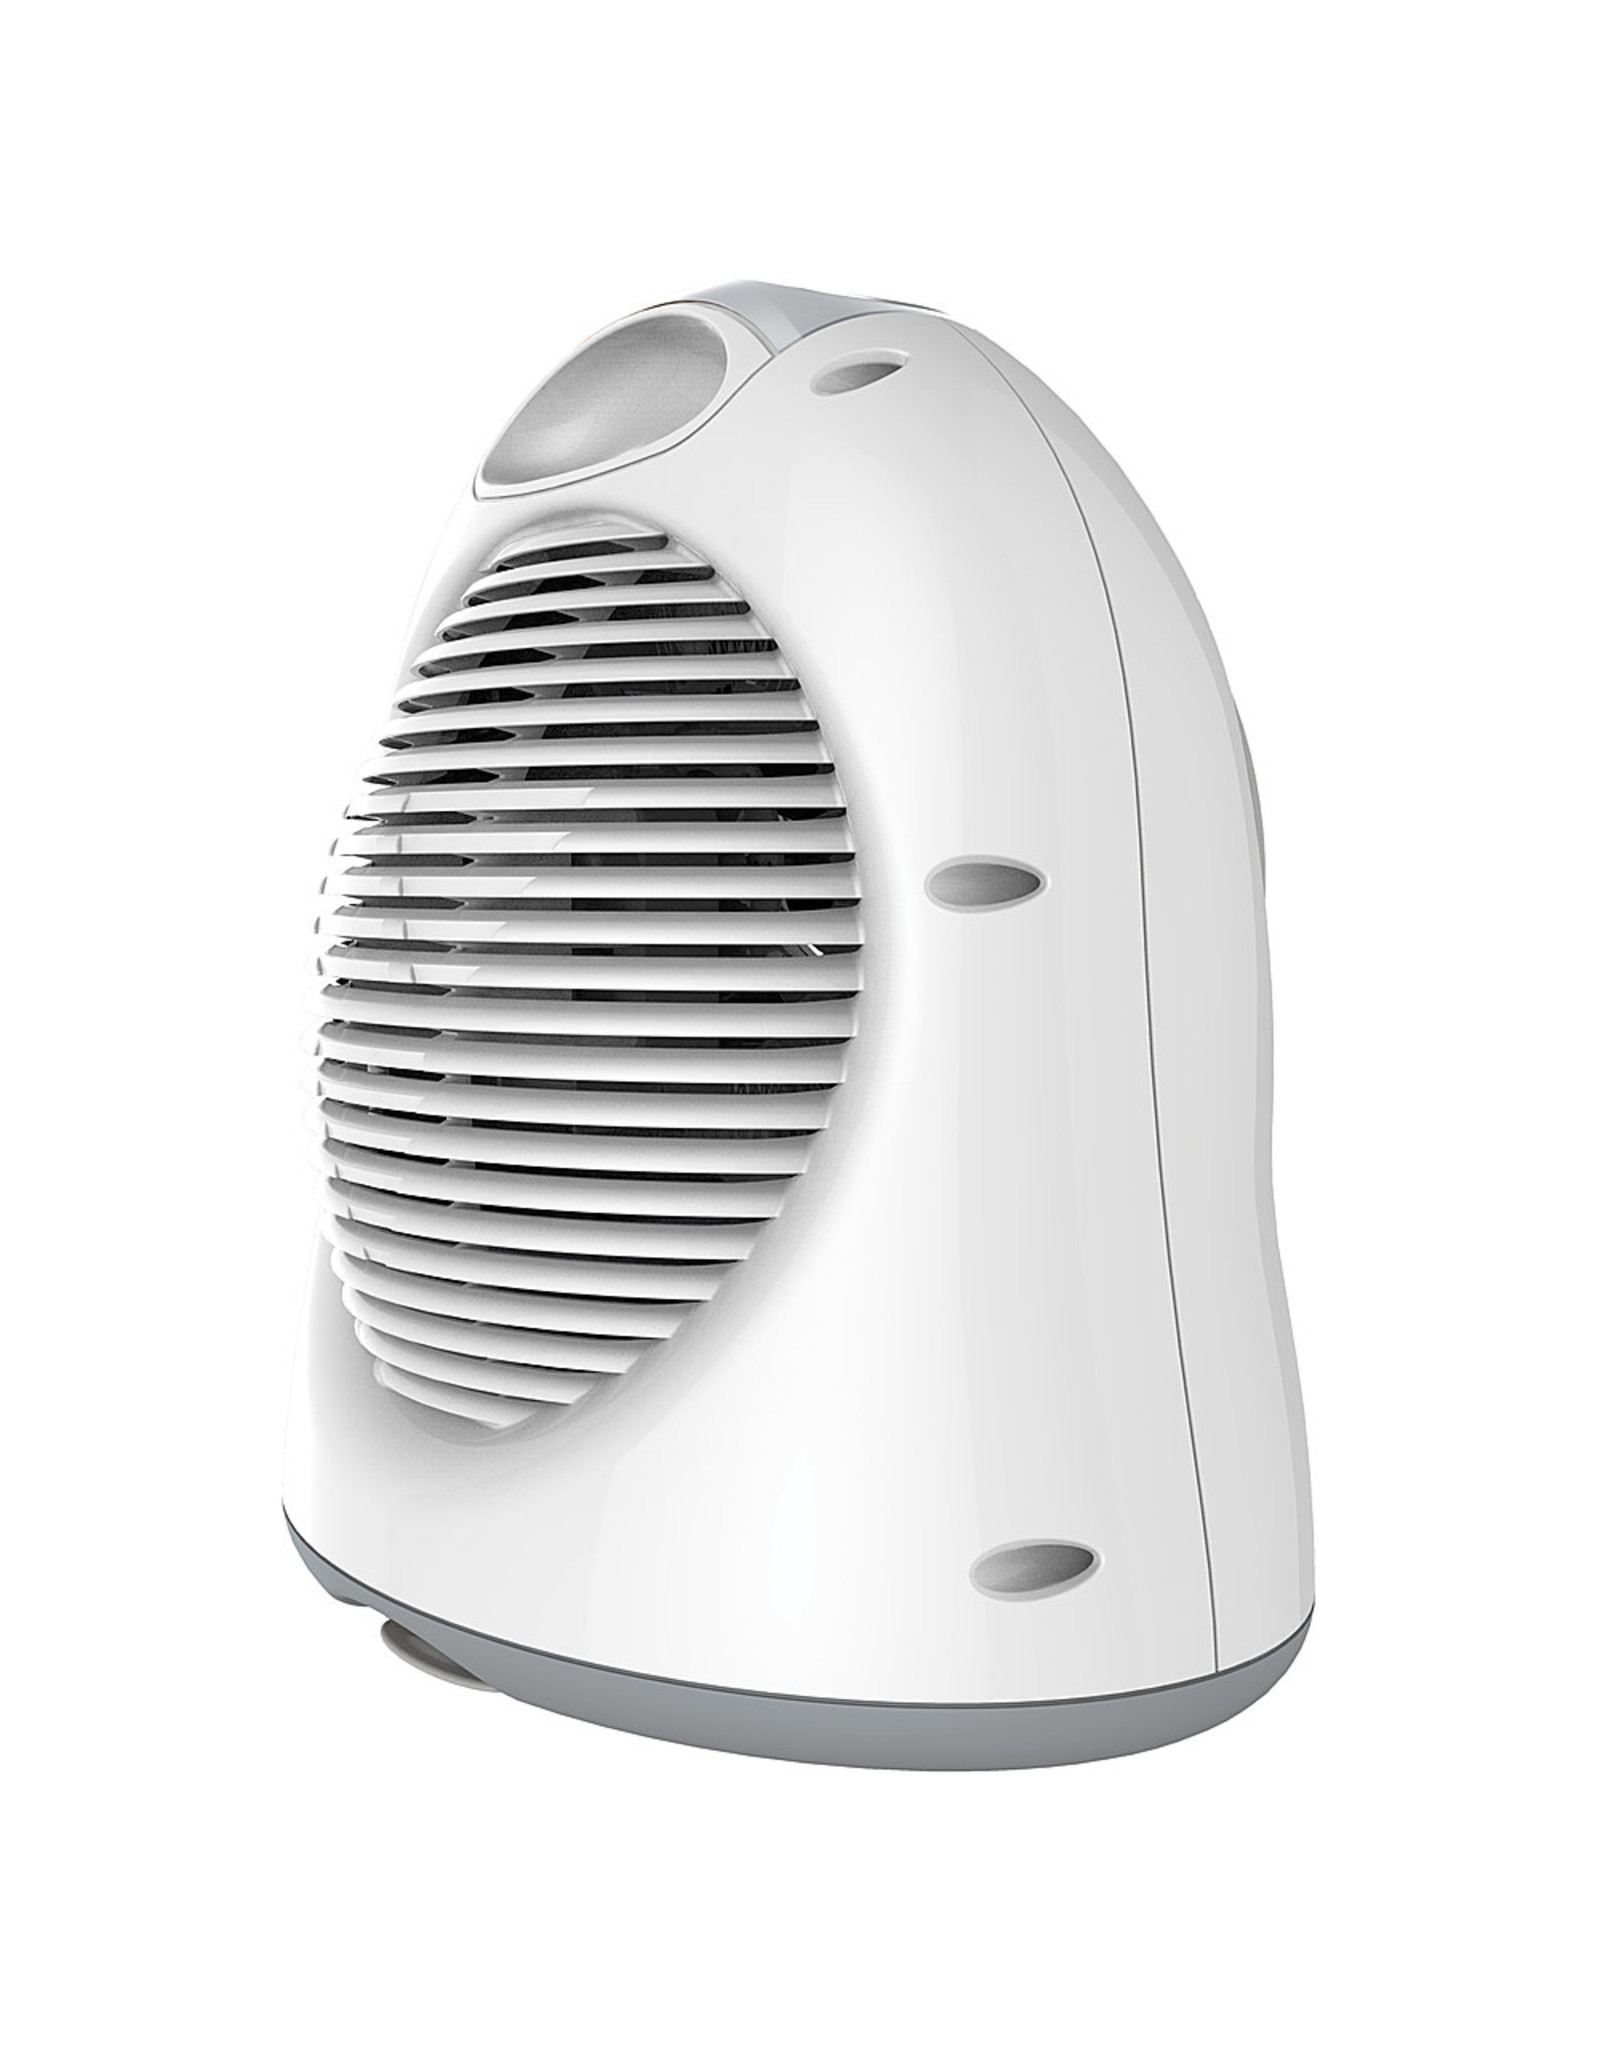 Vornadobaby EH1-0138-43 Vornadobaby - Sensa Nursery Space Heater - White